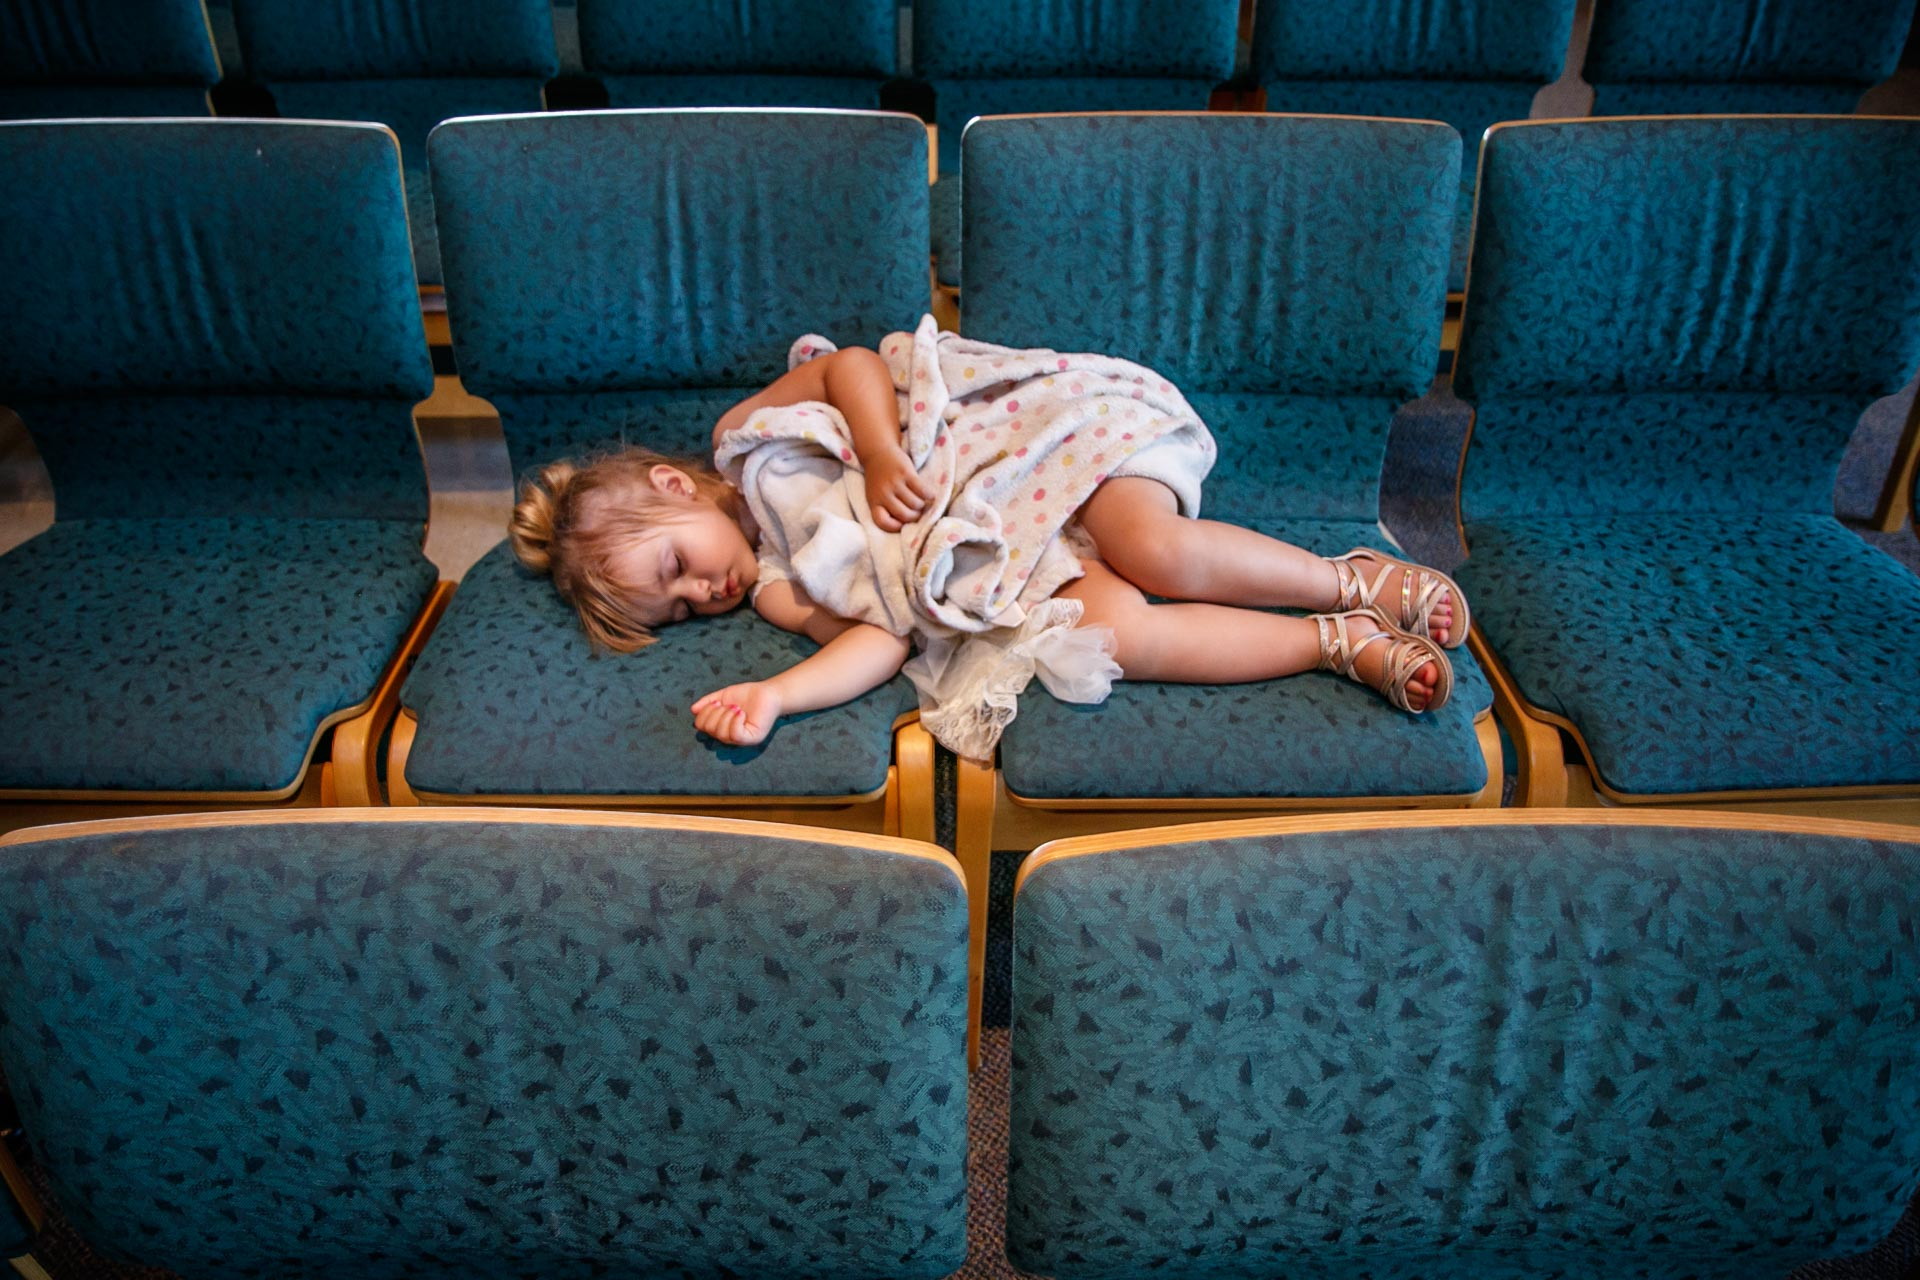 st-joan-of-arc-catholic-church-delafield-adam-shea-photography-green-bay-appleton-neenah-photographer-23.jpg